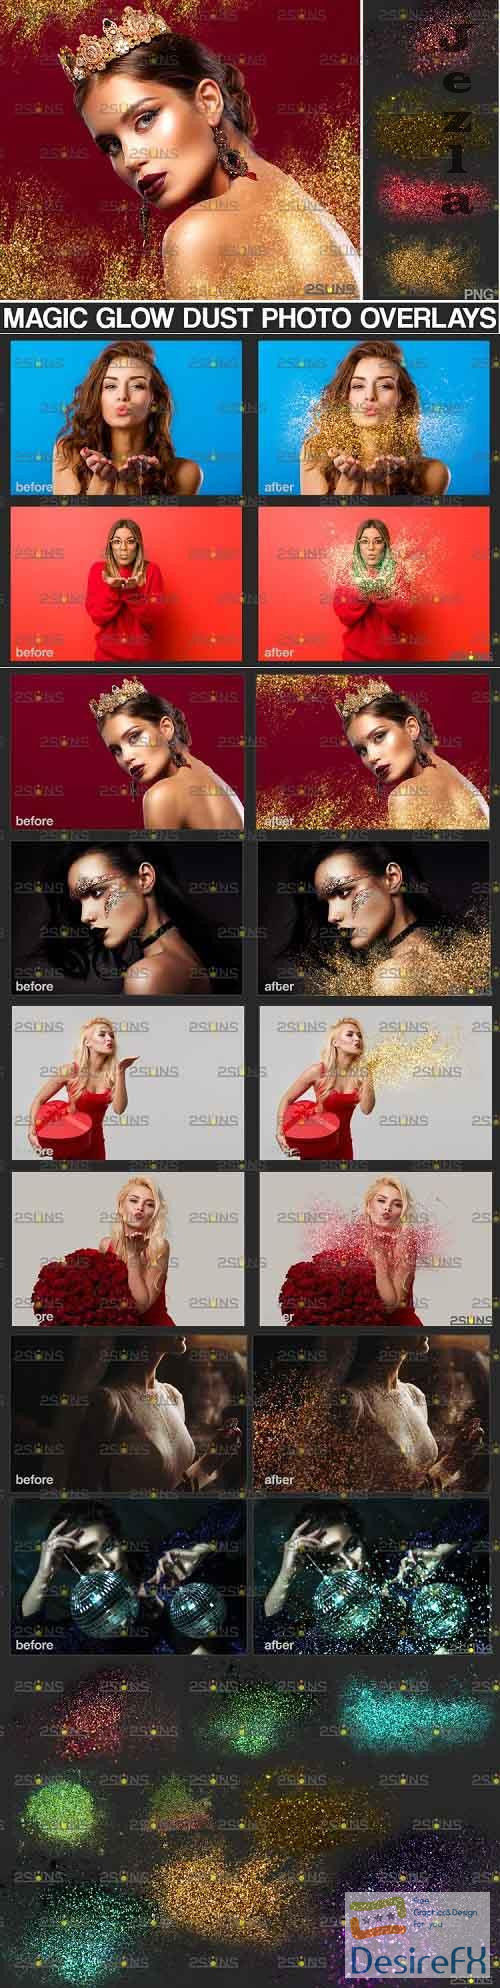 Blowing glitter overlay & Photoshop overlay - 895349